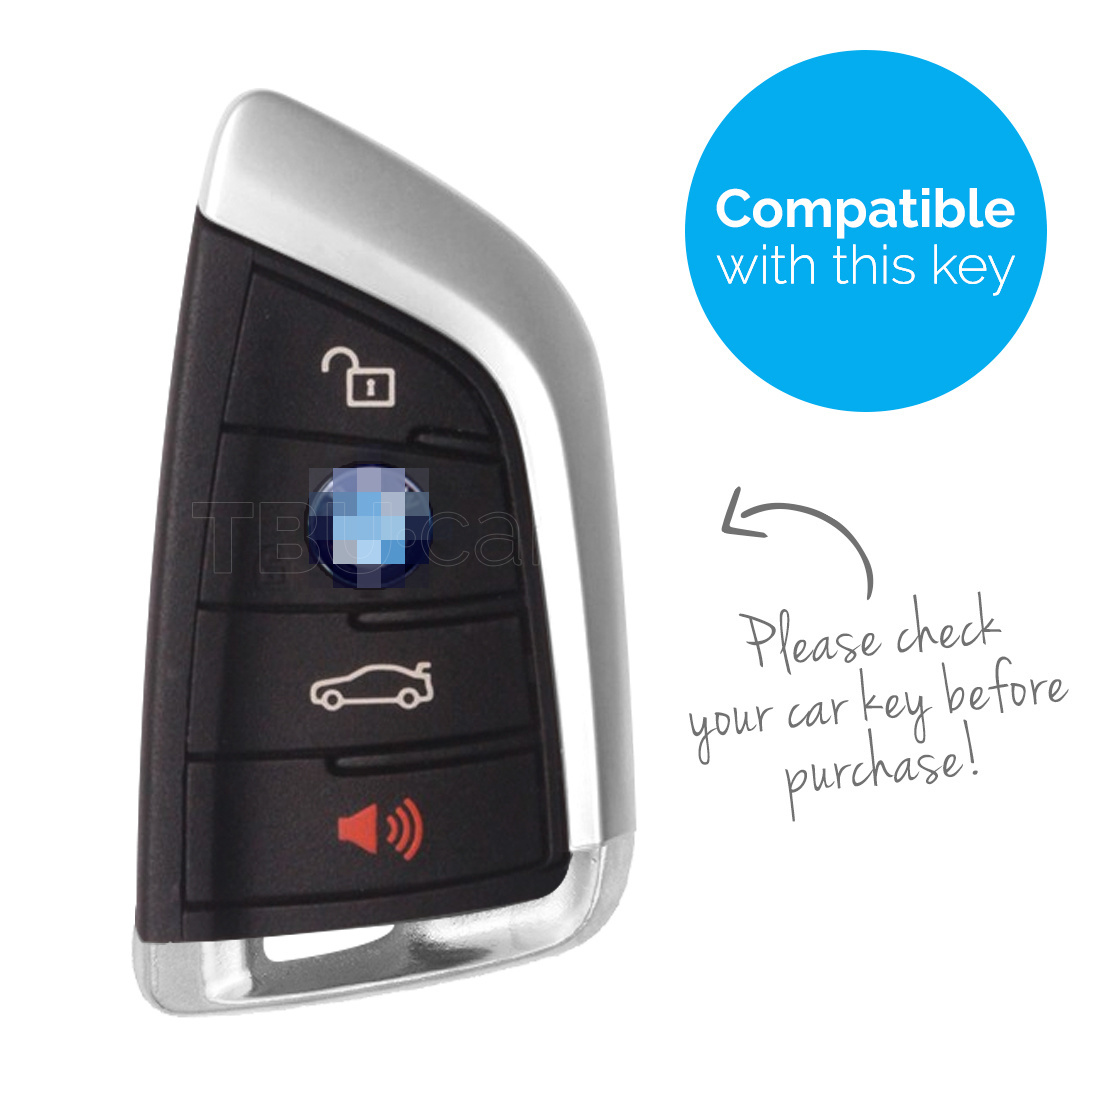 TBU car BMW Sleutel Cover - Silicone sleutelhoesje - beschermhoesje autosleutel - Blauw